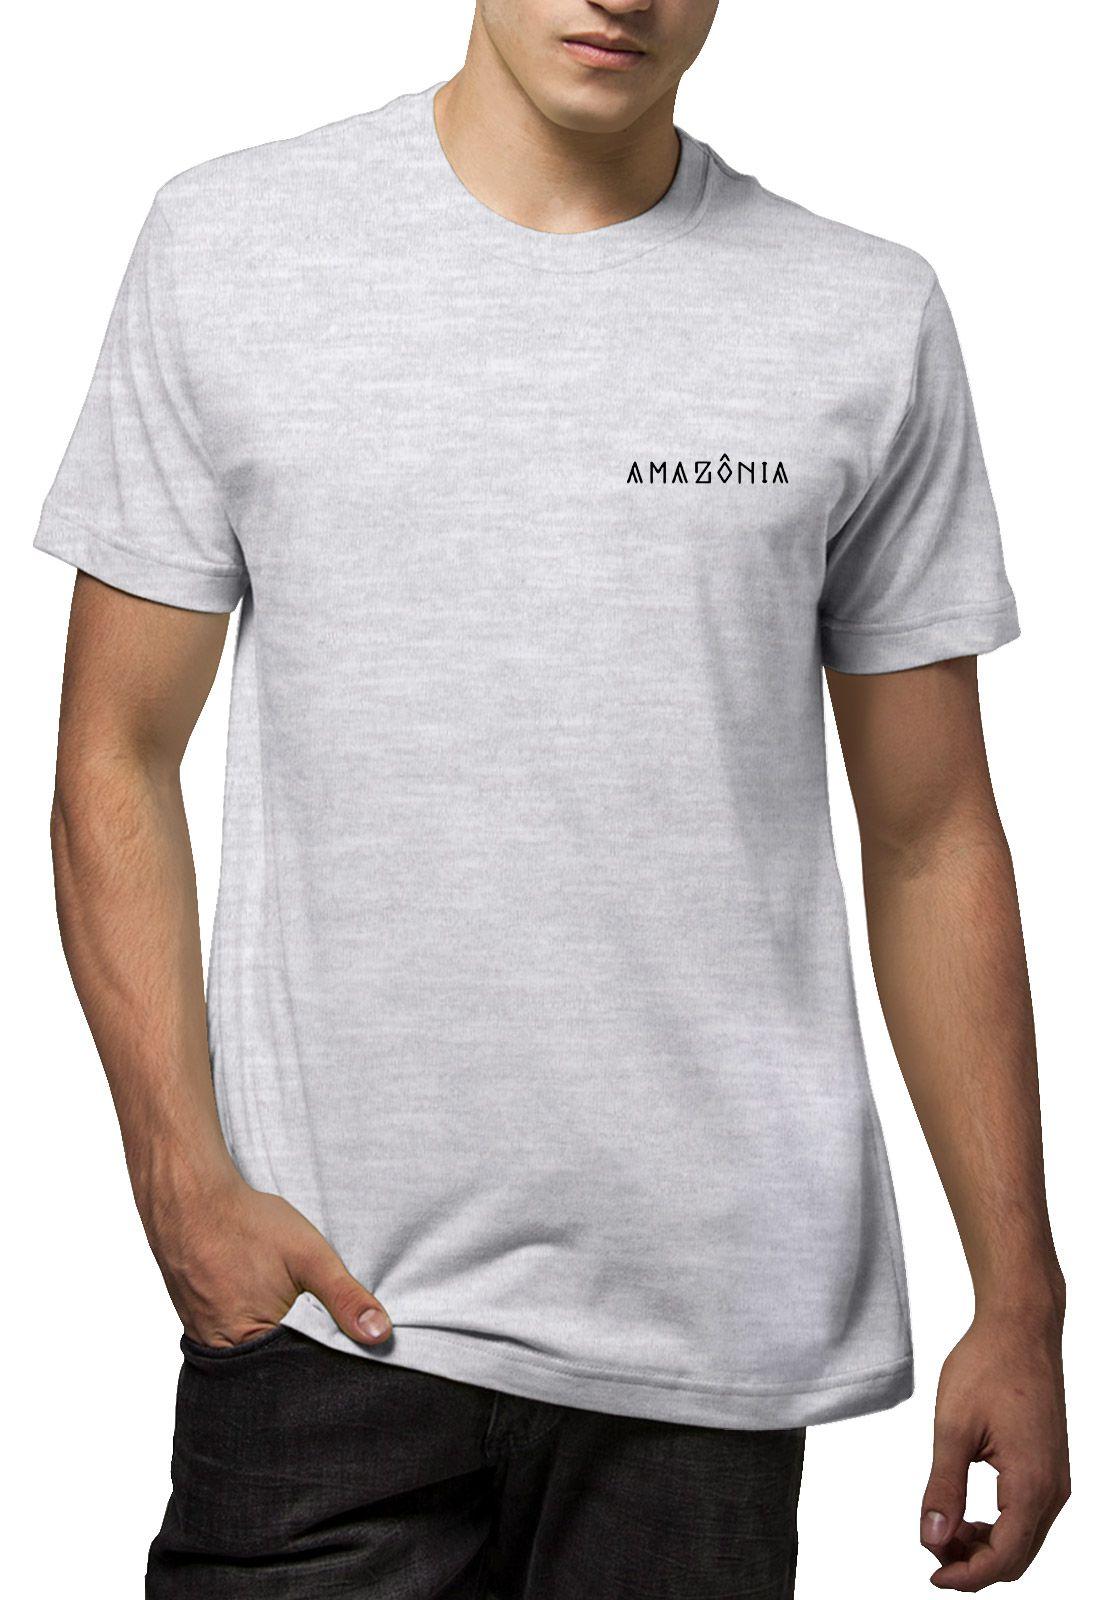 Camiseta Amazônia Cocar Indígena - Mescla Claro